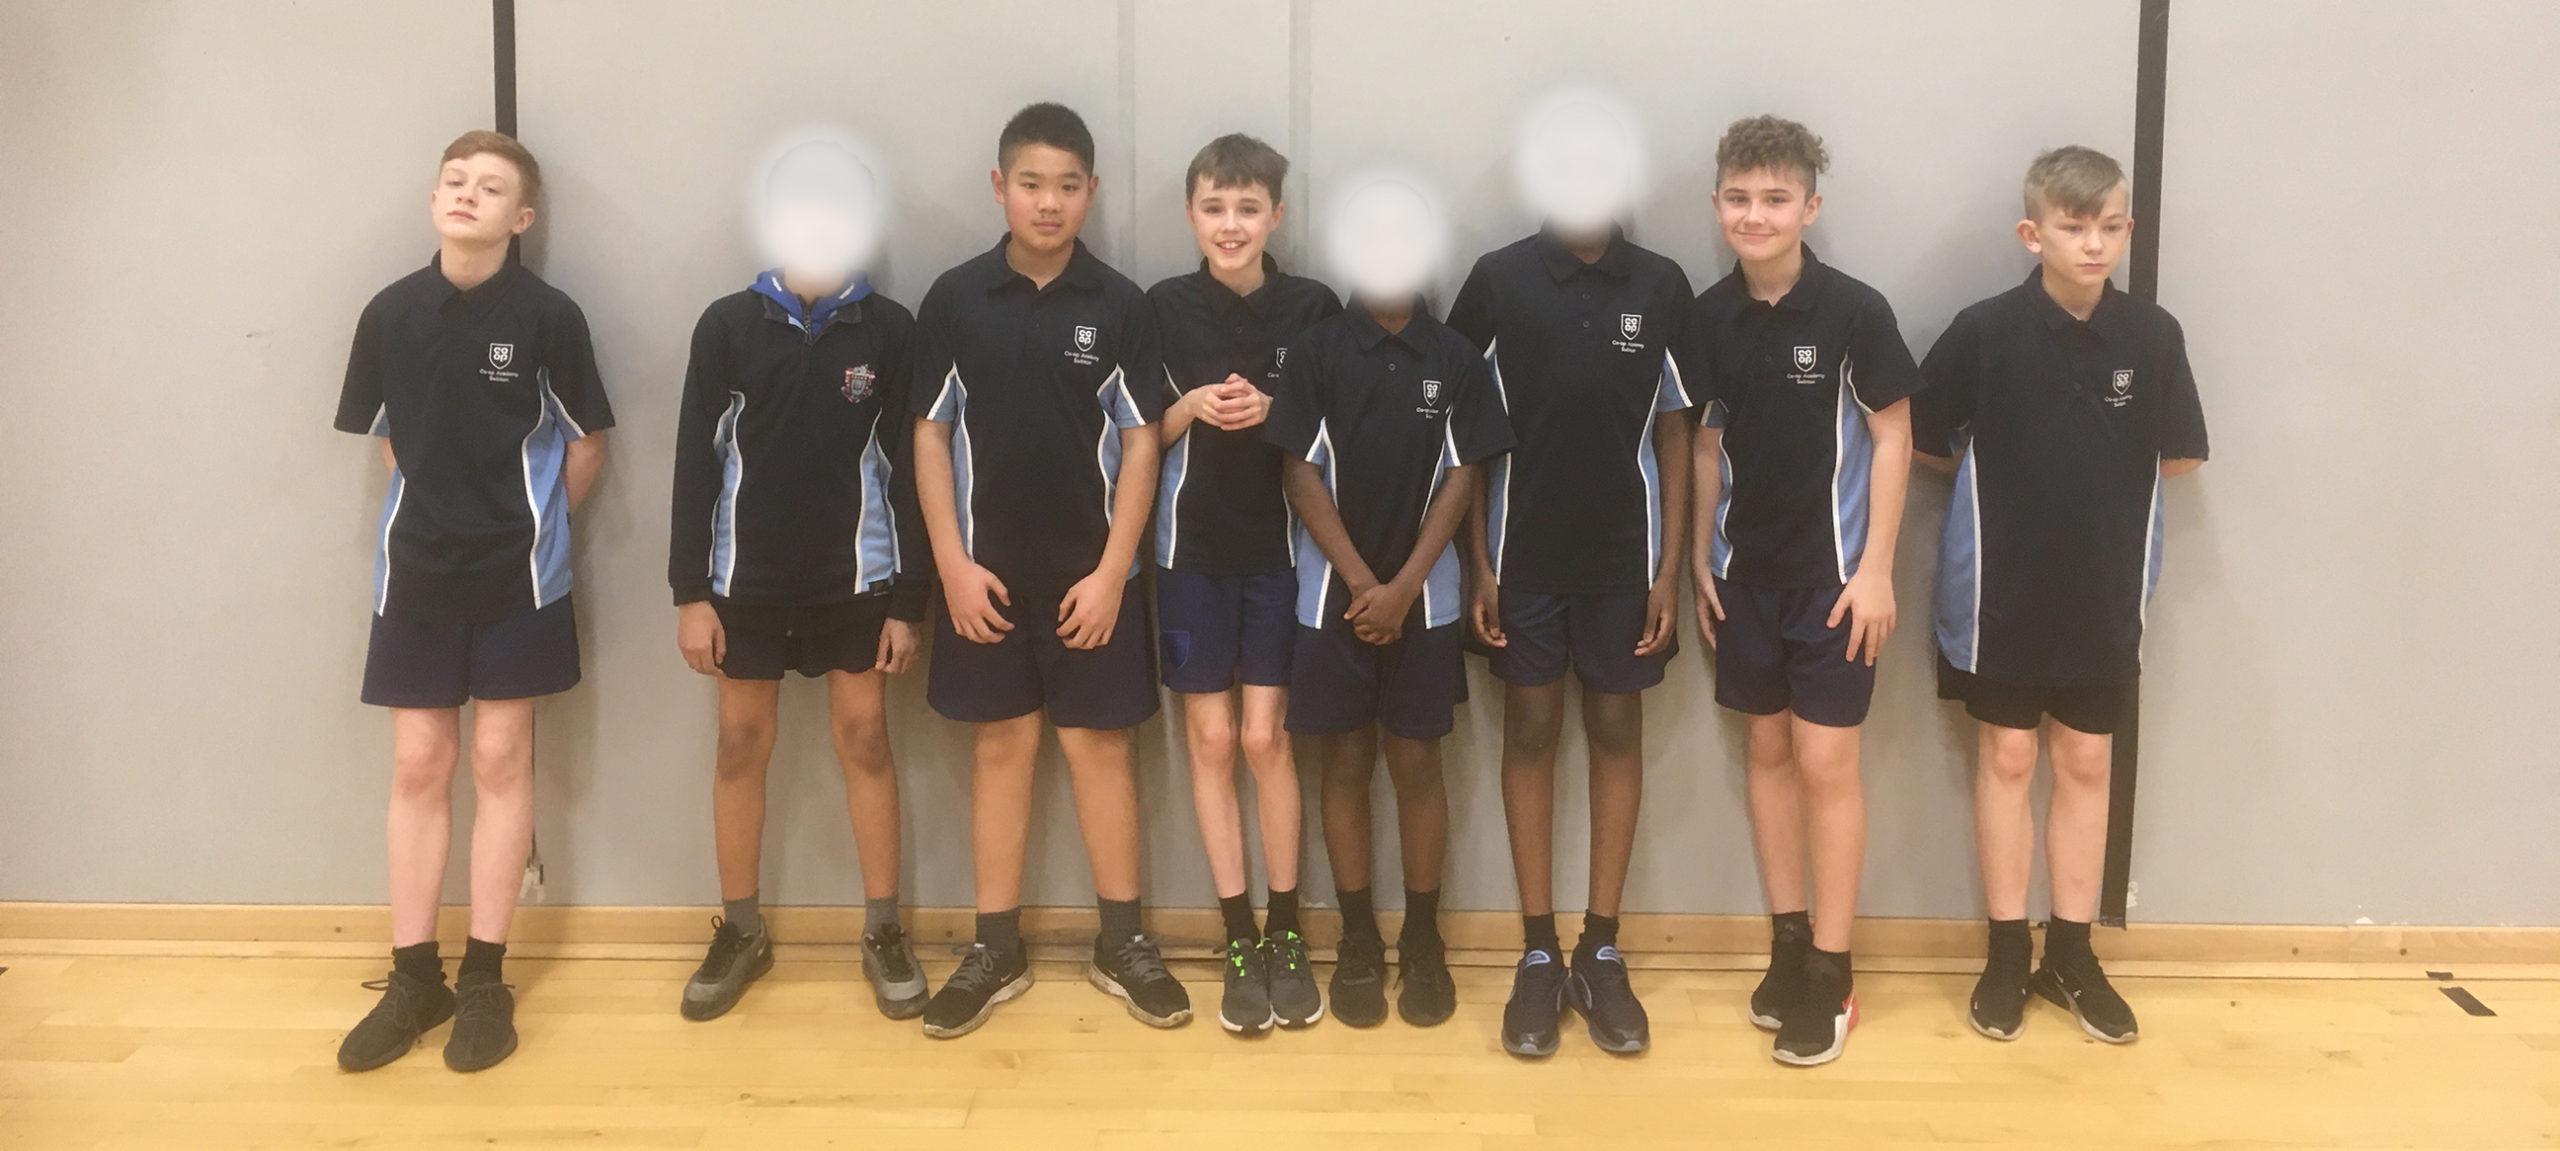 Soaring high in Salford School's Cricket Championship